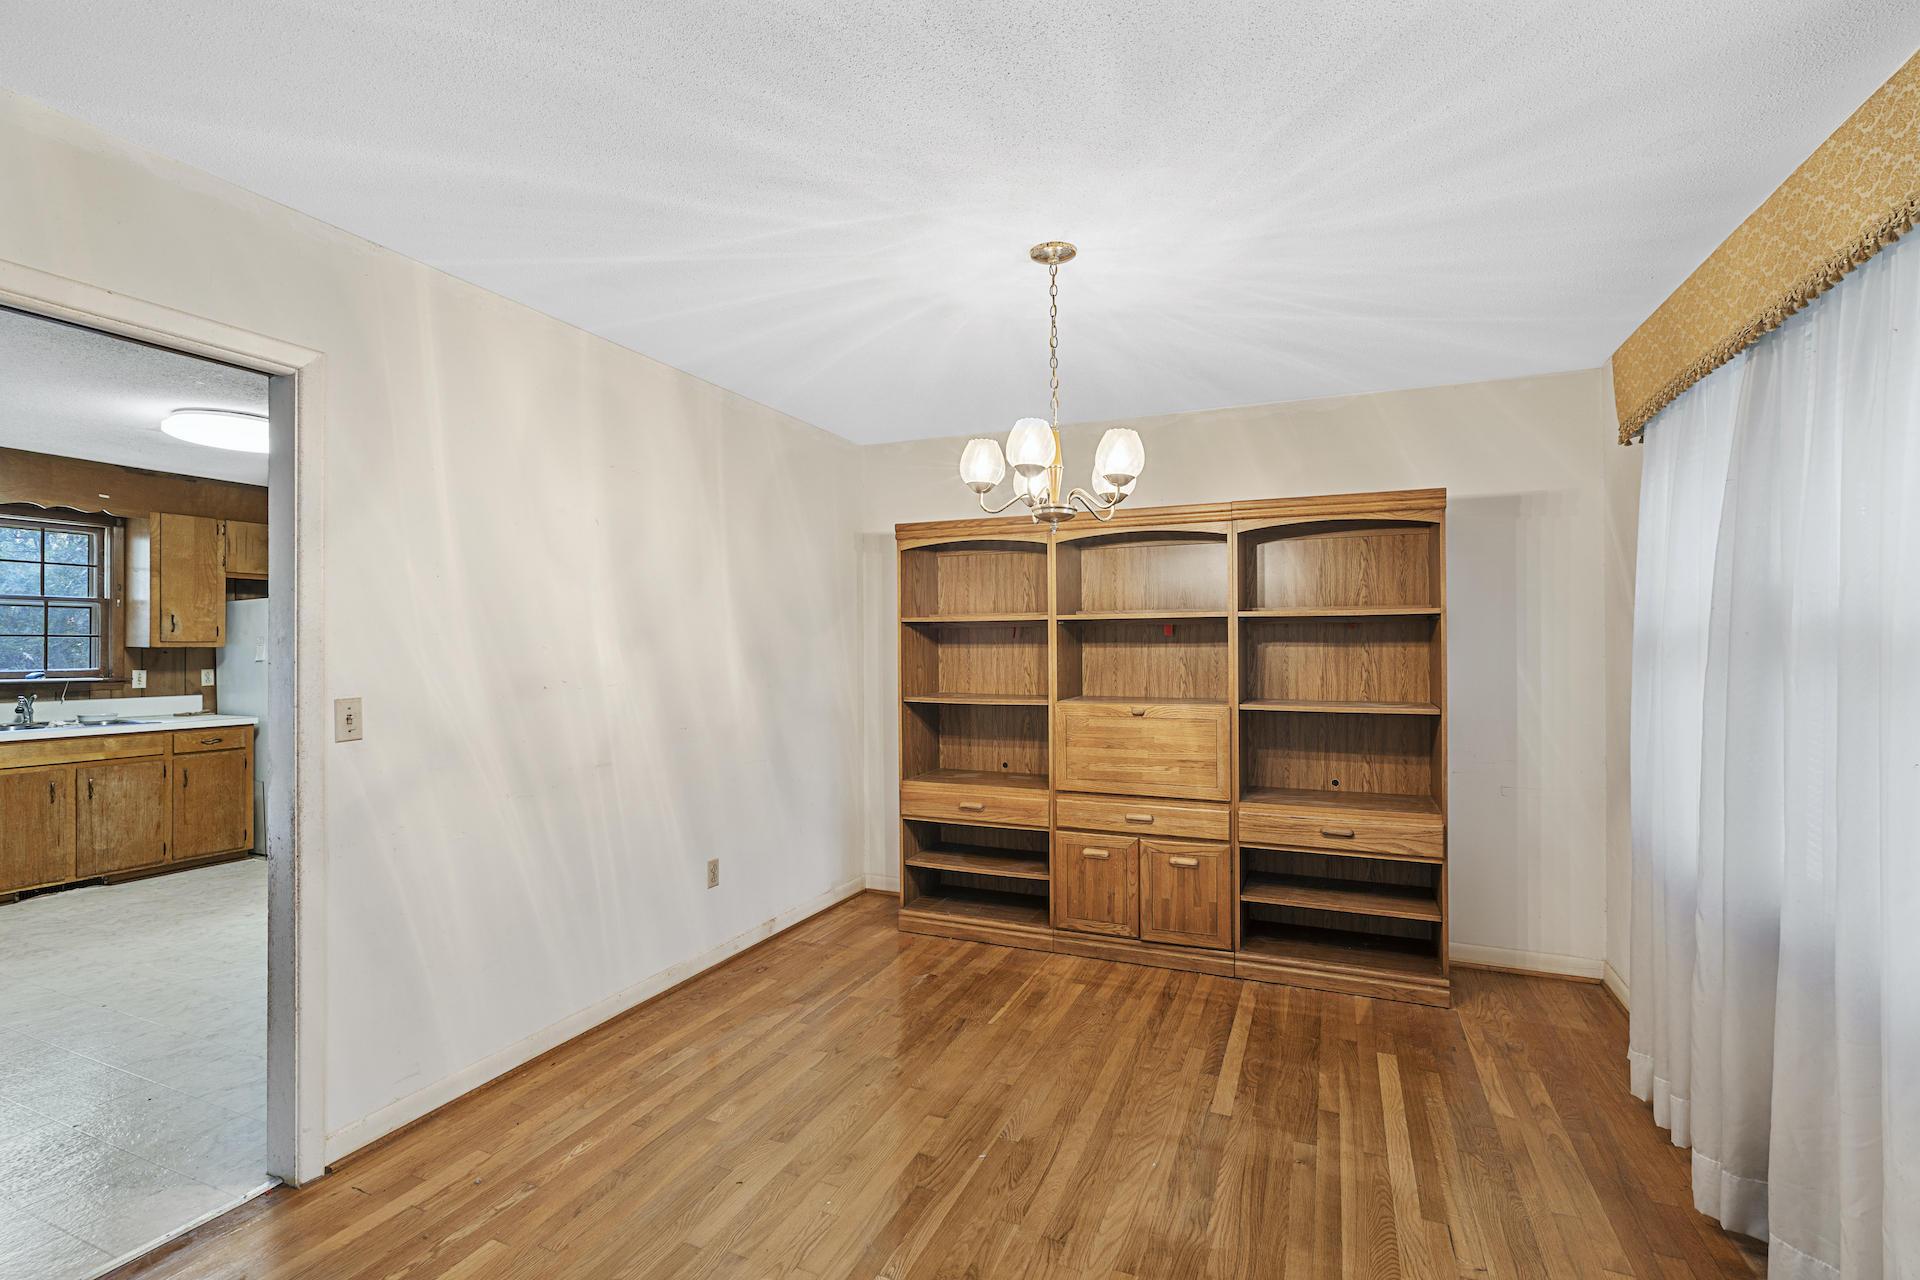 Charlestowne Estates I Homes For Sale - 1137 Culpepper, Charleston, SC - 2